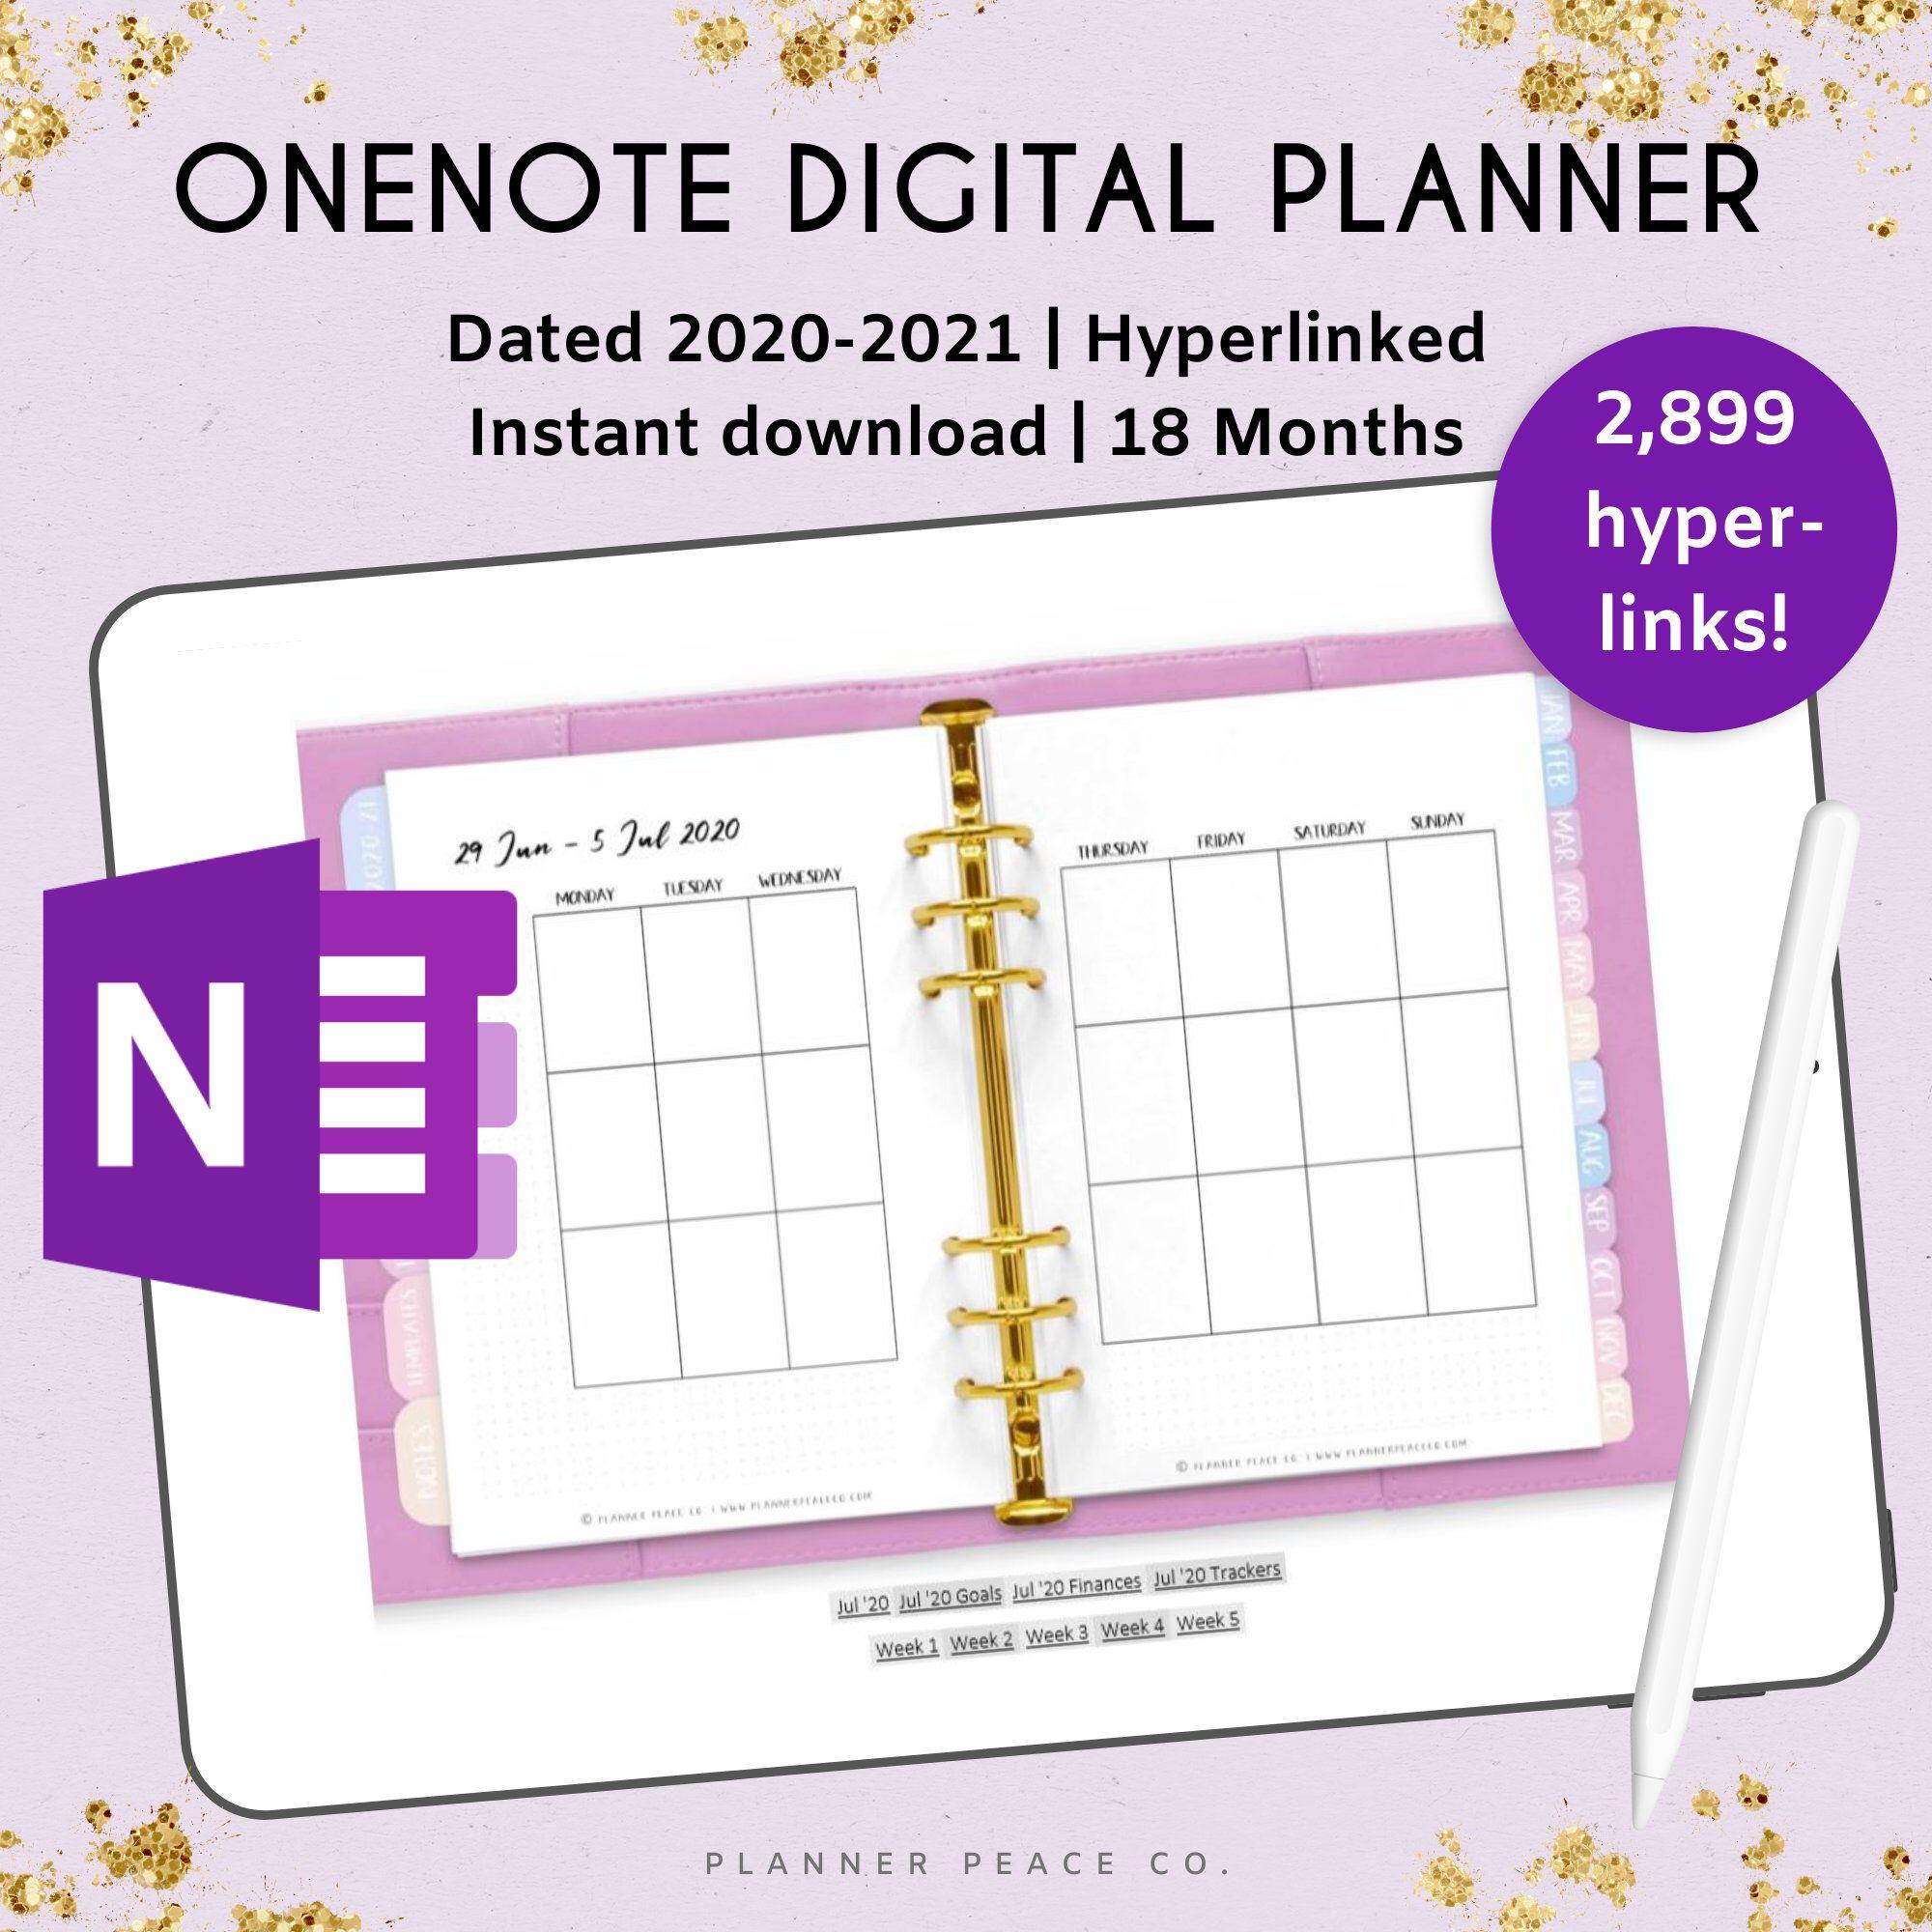 2020 2021 OneNote Digital Planner with hyperlinks Windows